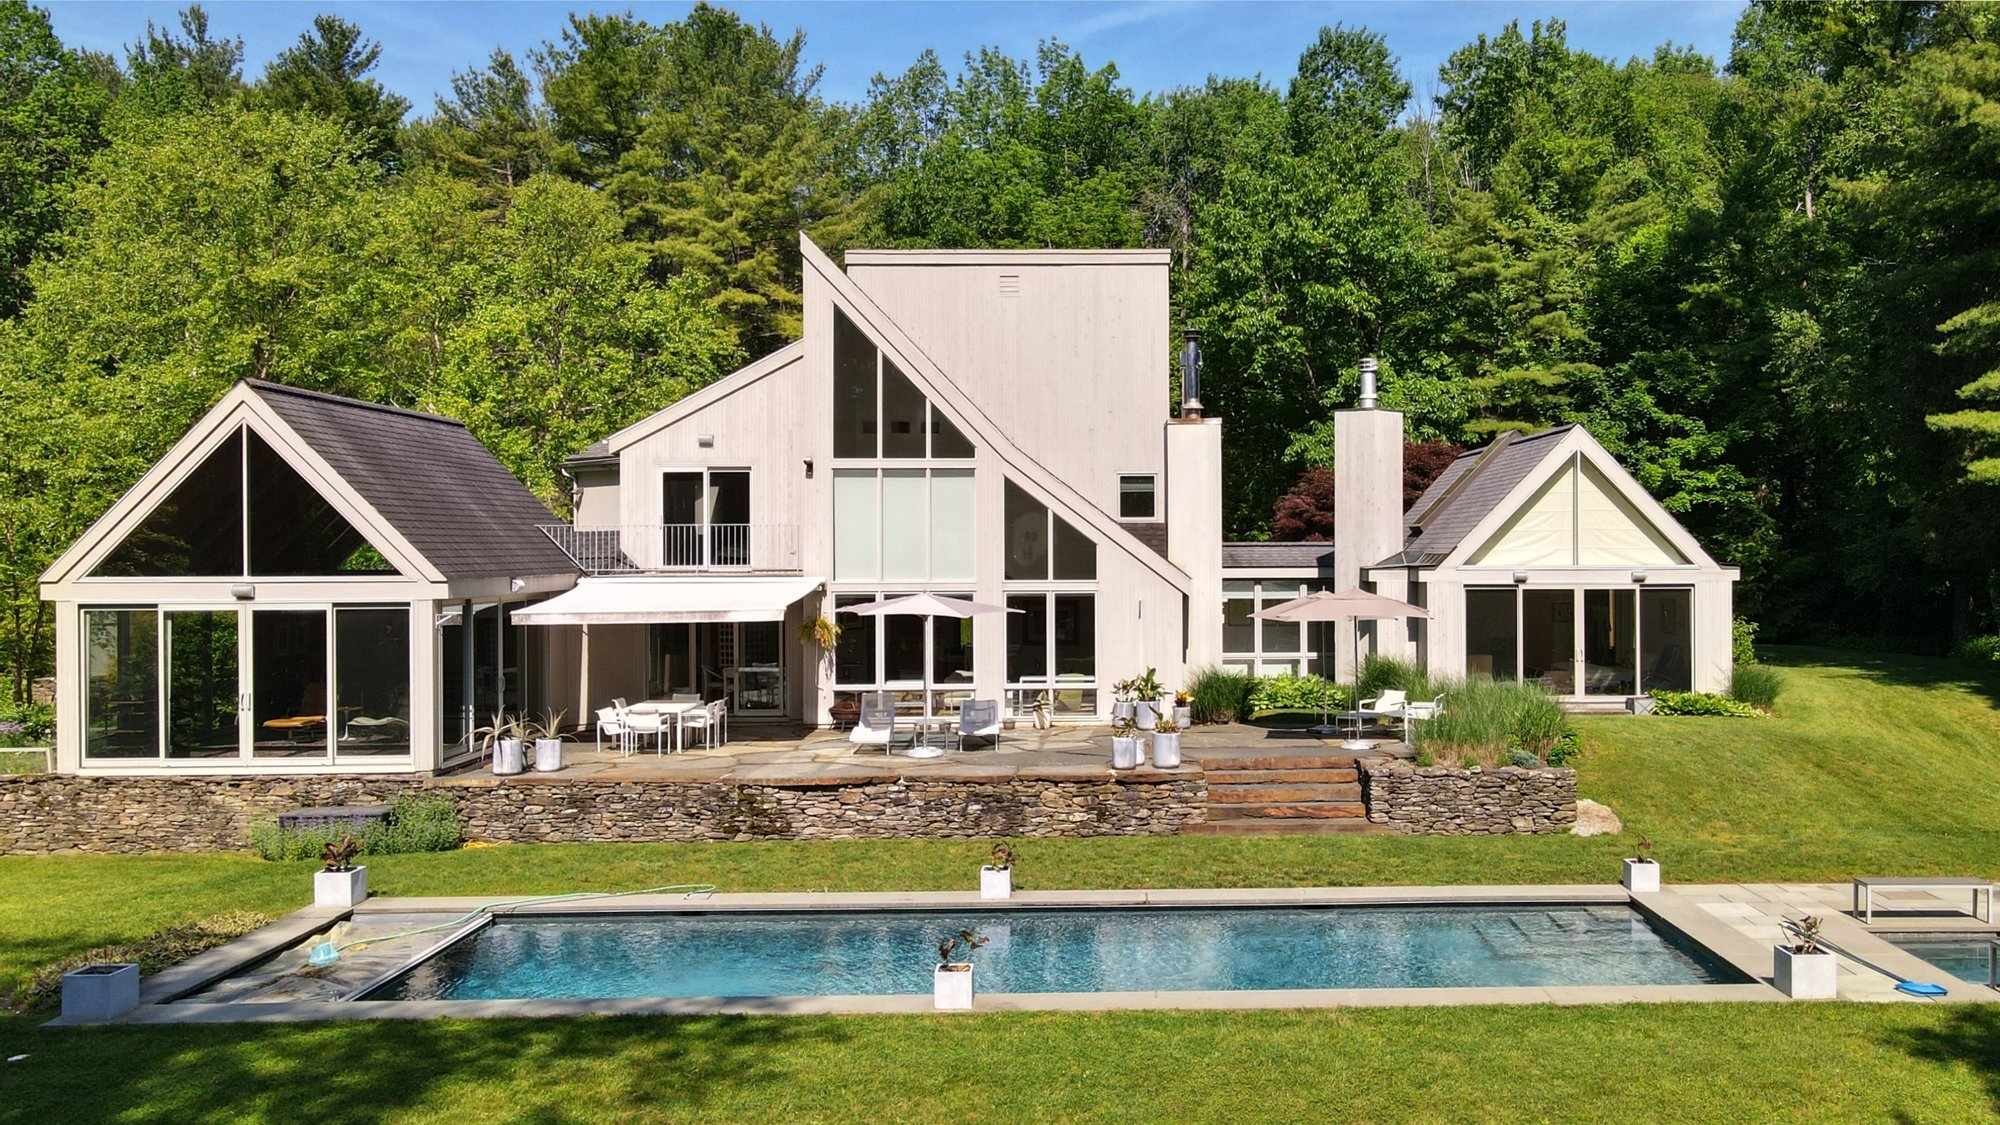 House in Great Barrington, Massachusetts, United States 1